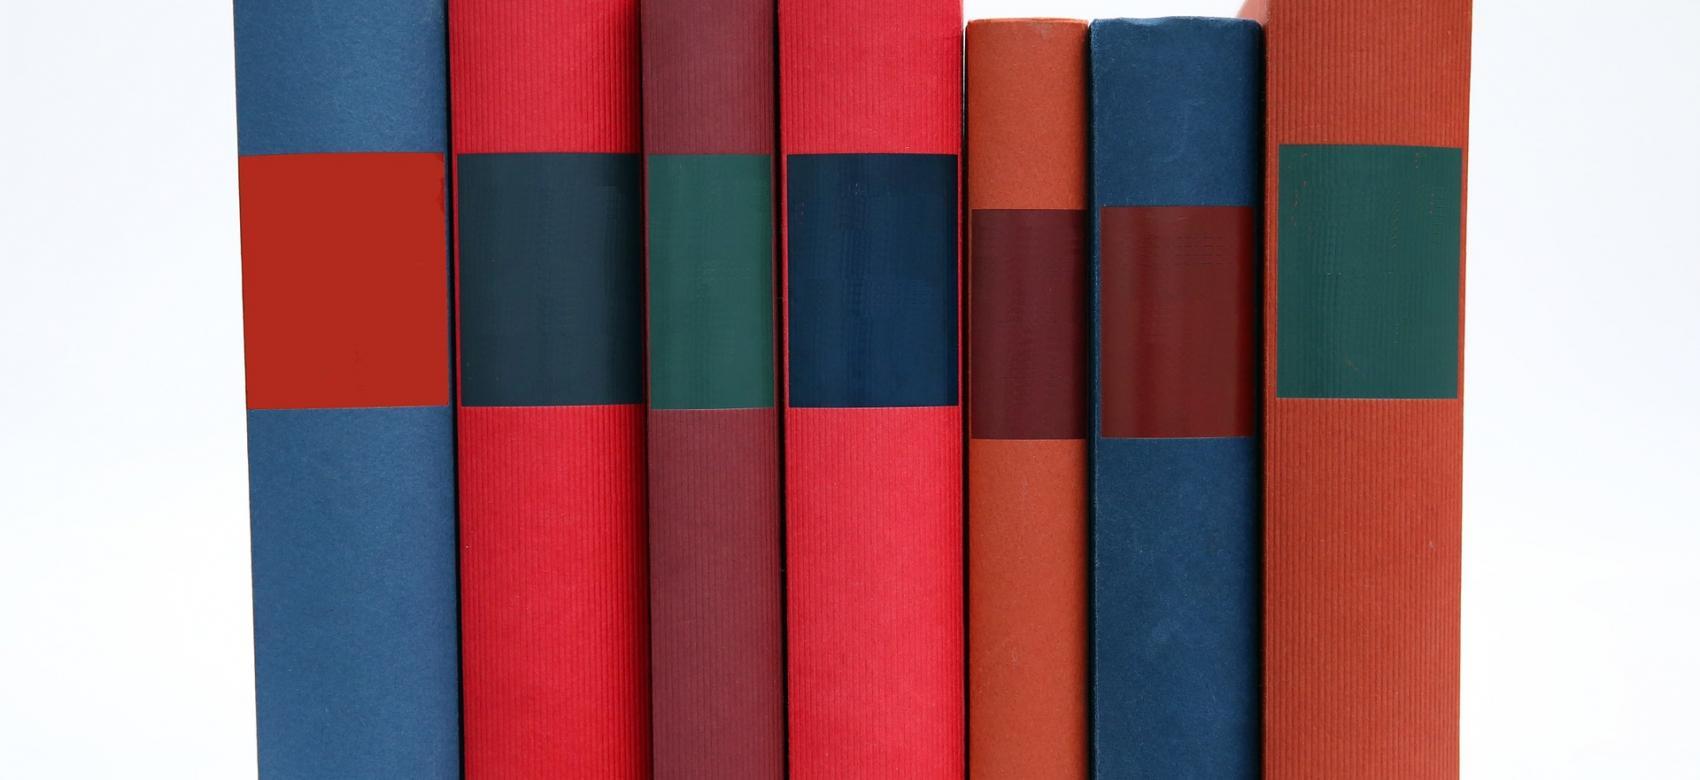 Libros en vertical